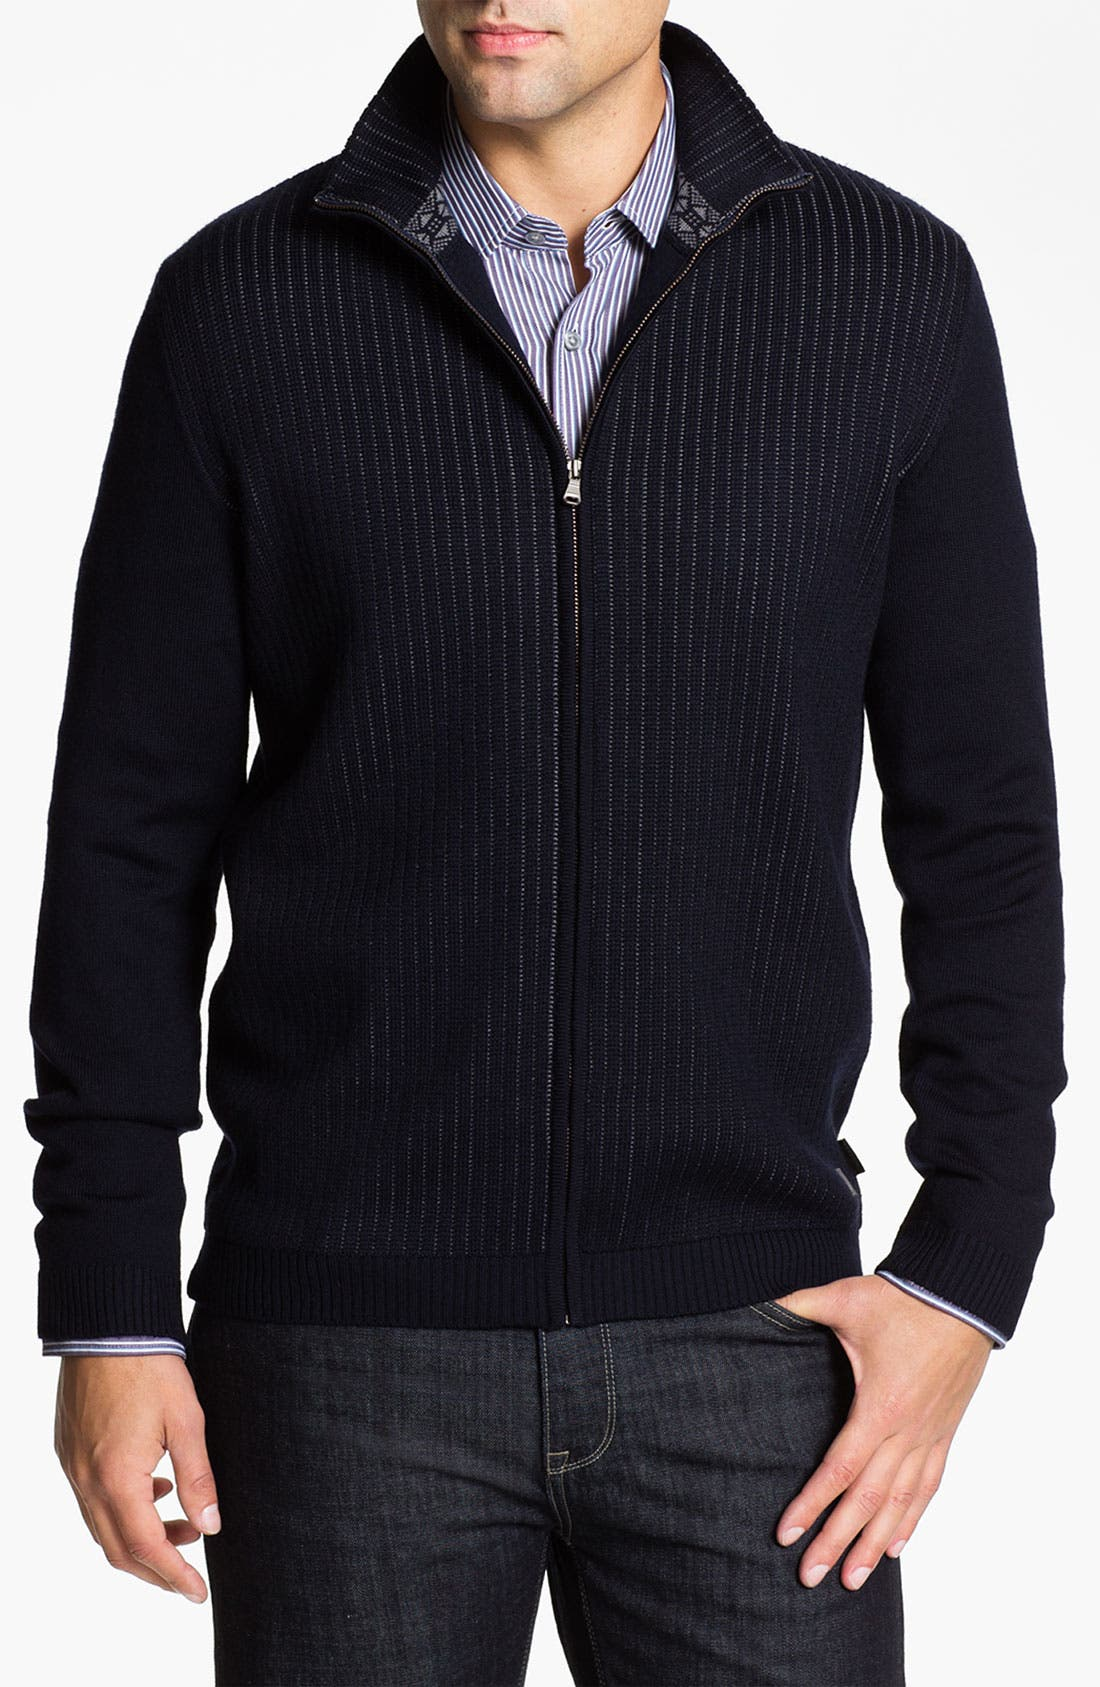 Alternate Image 1 Selected - BOSS Black 'Laro' Wool Zip Cardigan